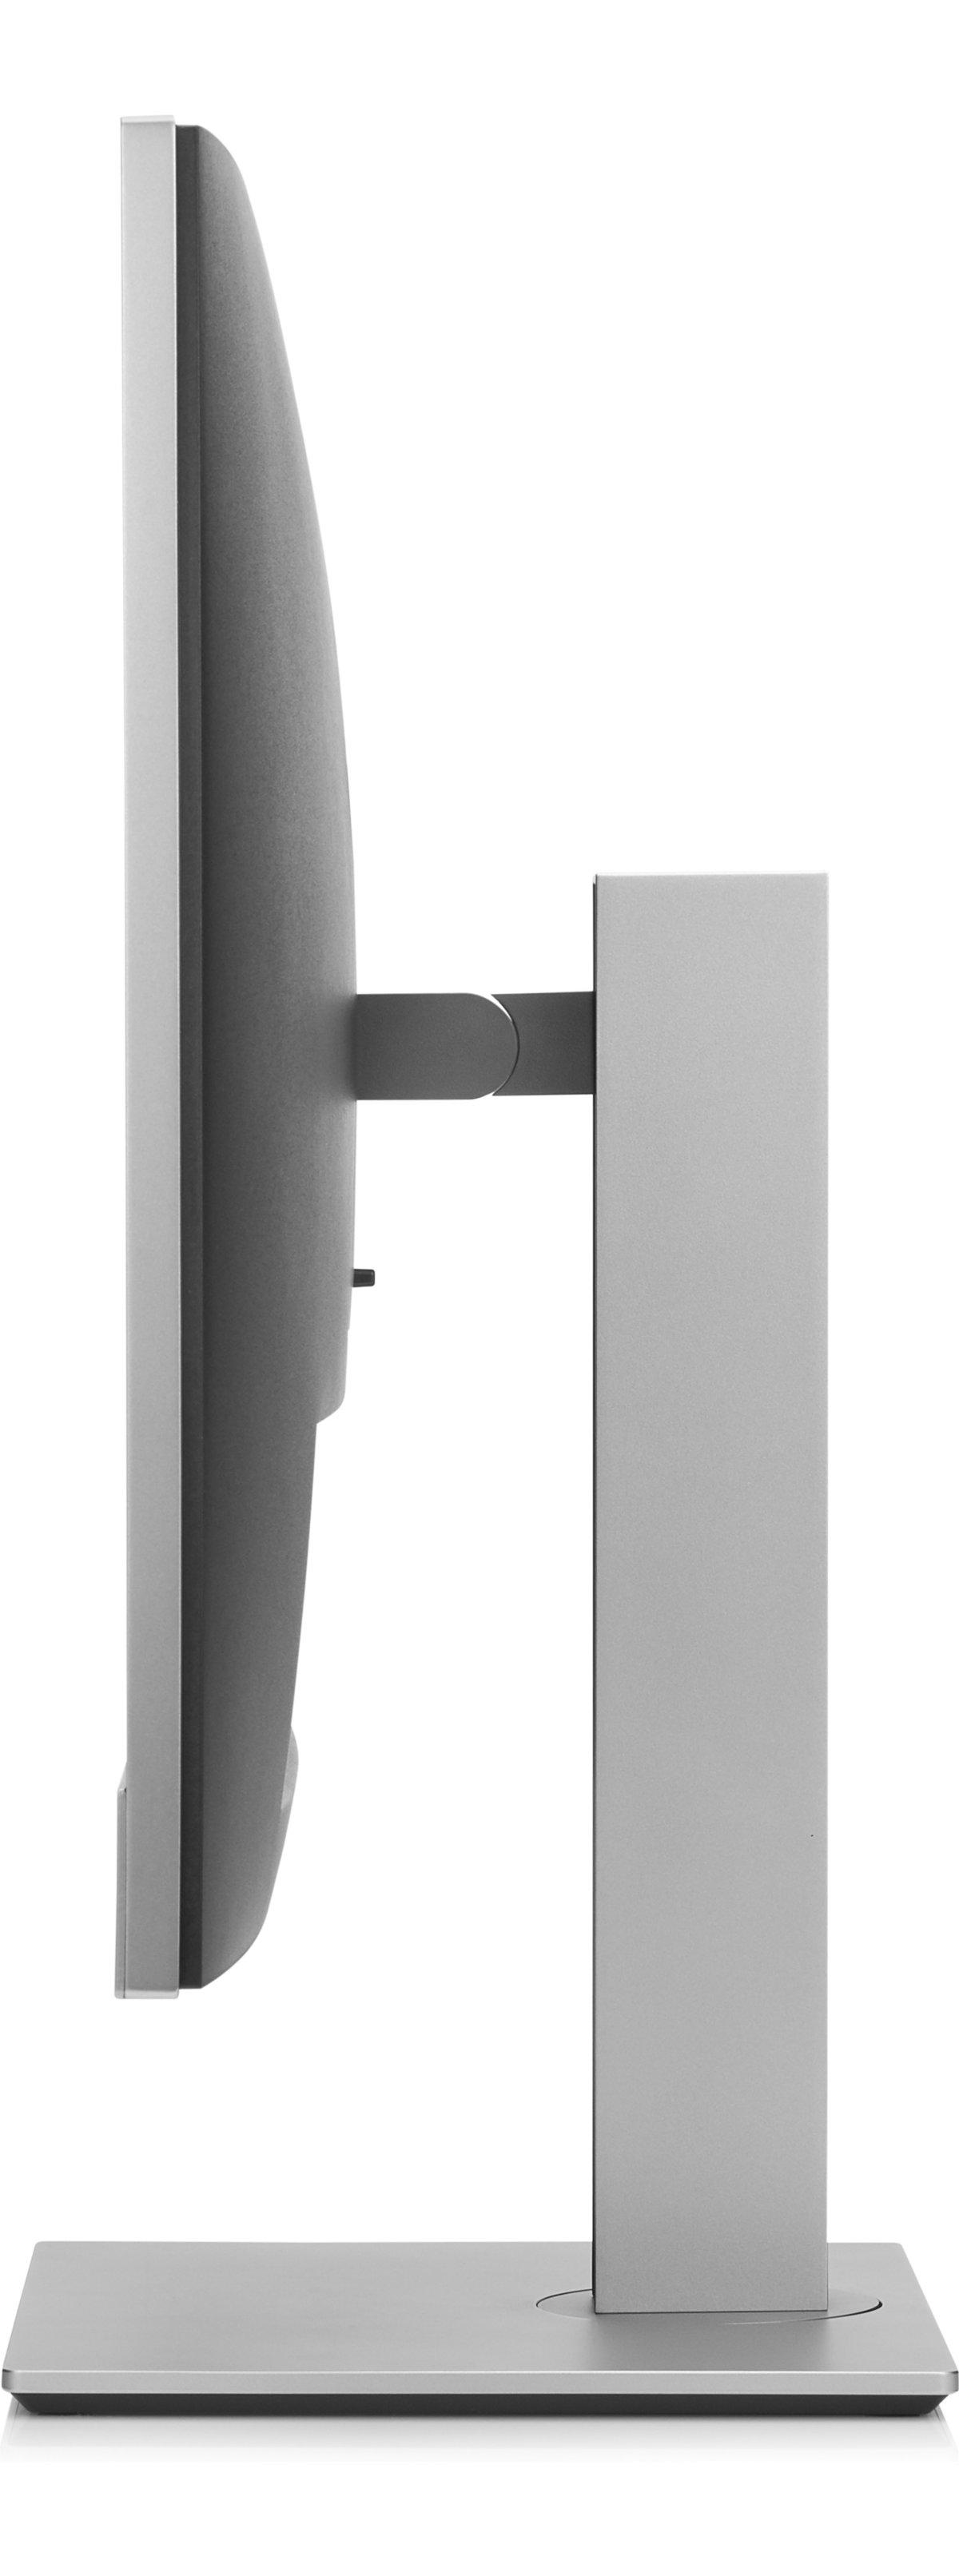 slide 5 of 5,show larger image, hp elitedisplay e273 27-inch monitor head only